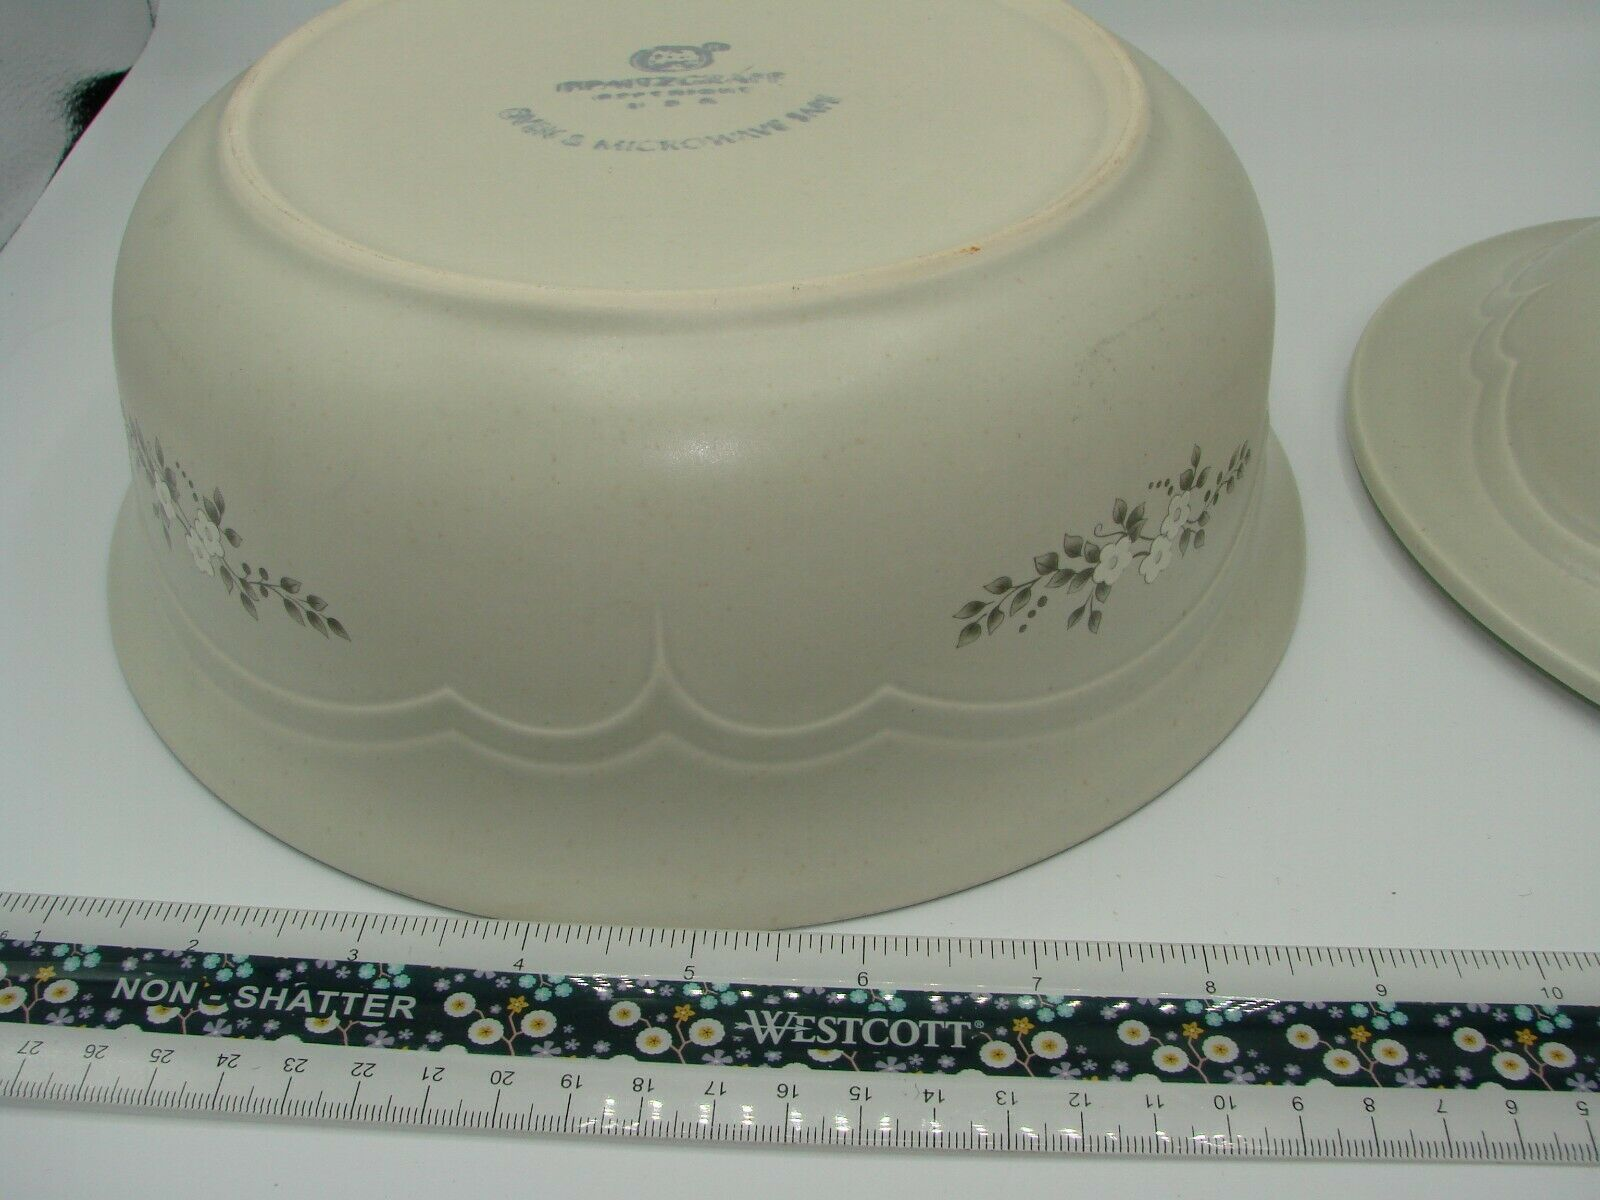 Pristine Pfaltzgraff Heirloom Covered Casserole Dish 8.75 2 Quart White Flowers image 8